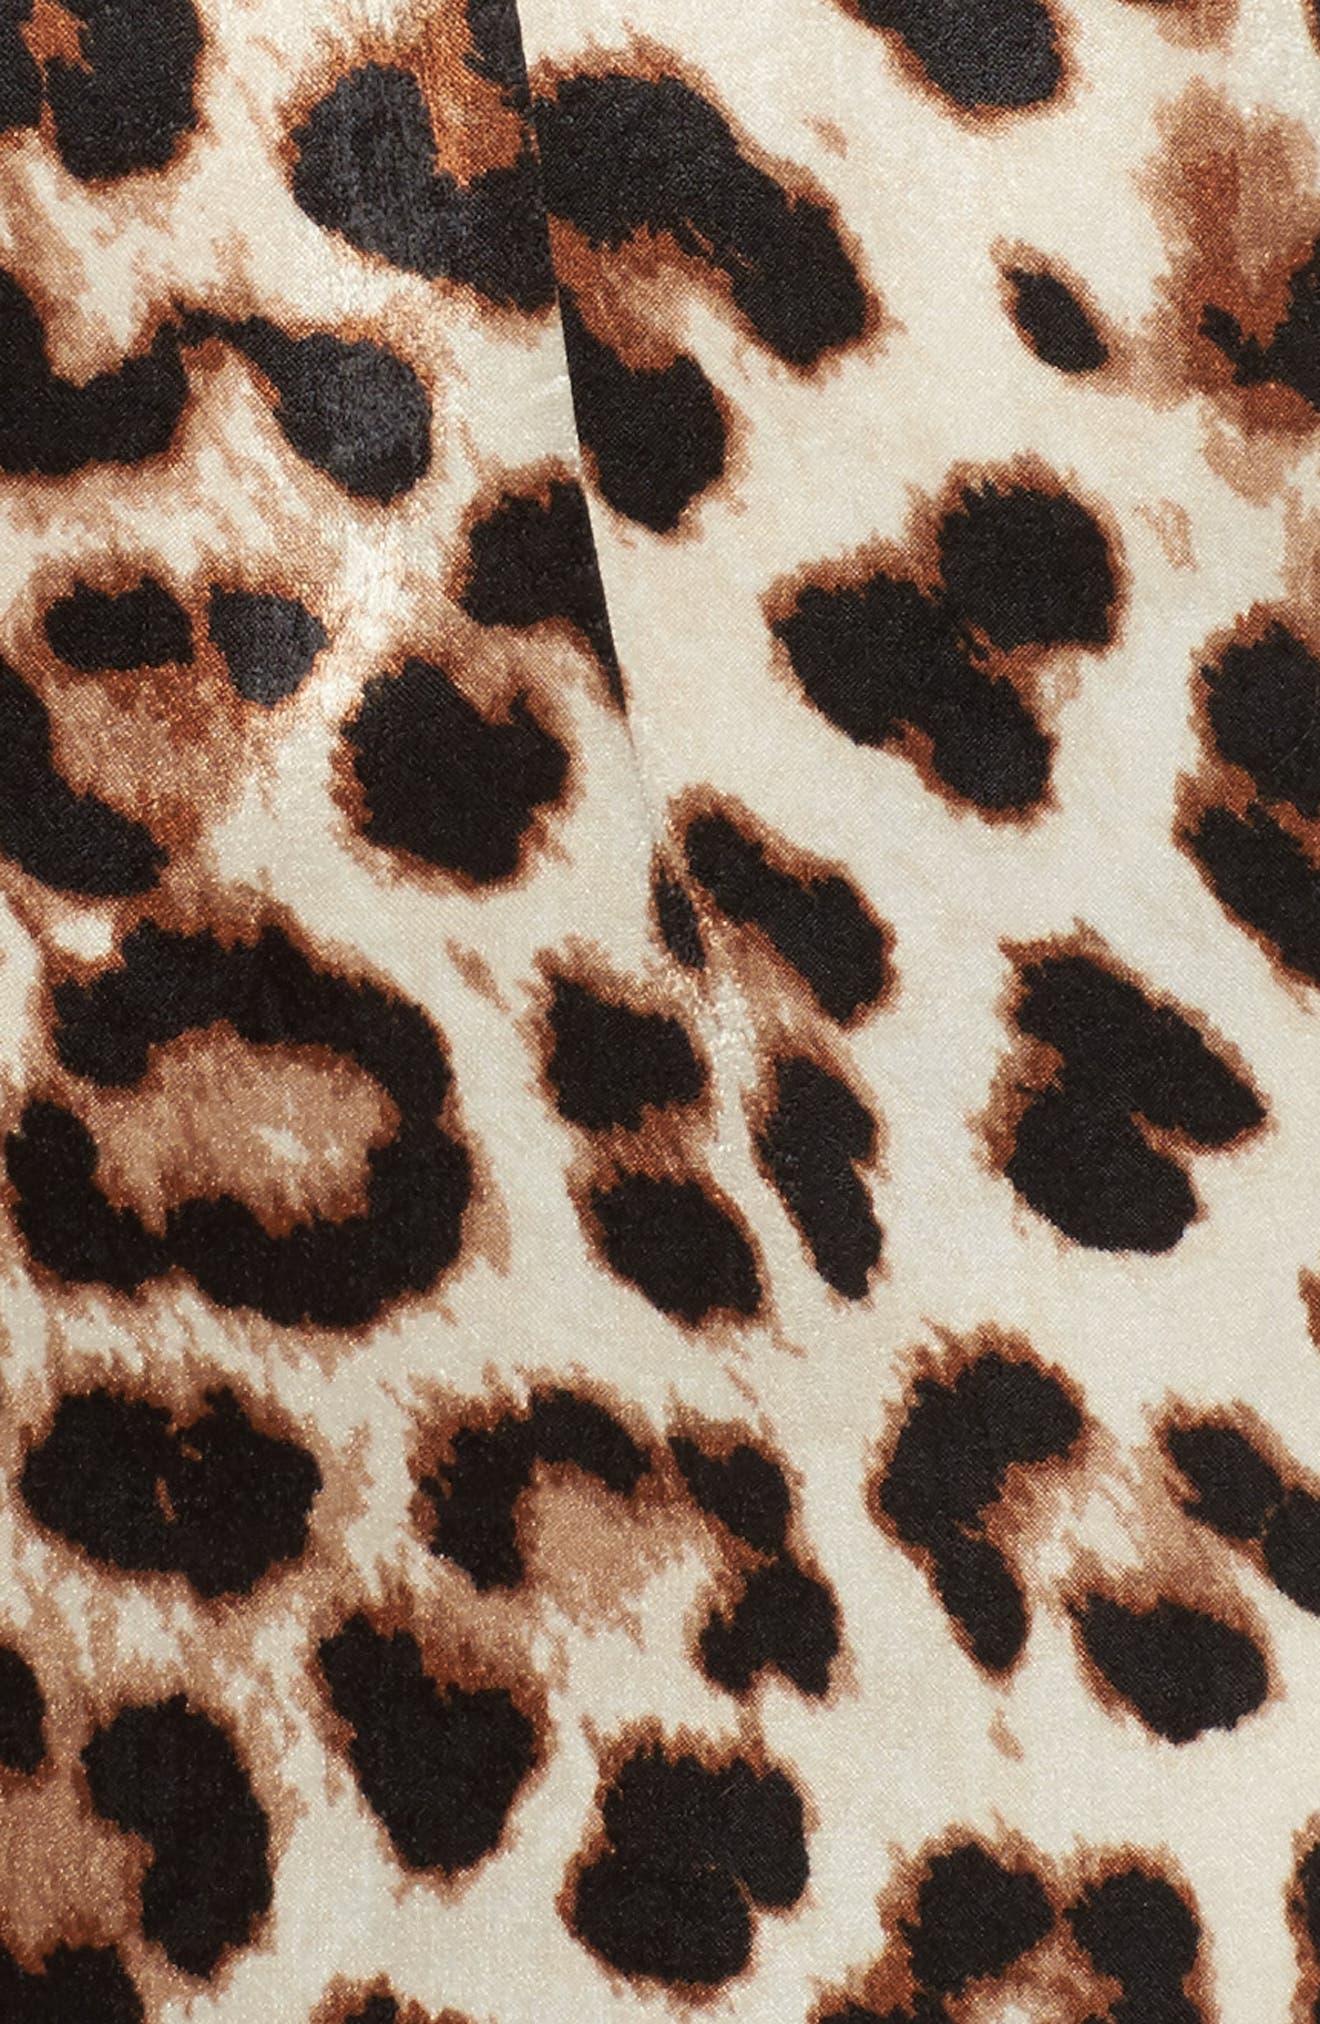 Leopard Print Choker Neck Romper,                             Alternate thumbnail 5, color,                             001